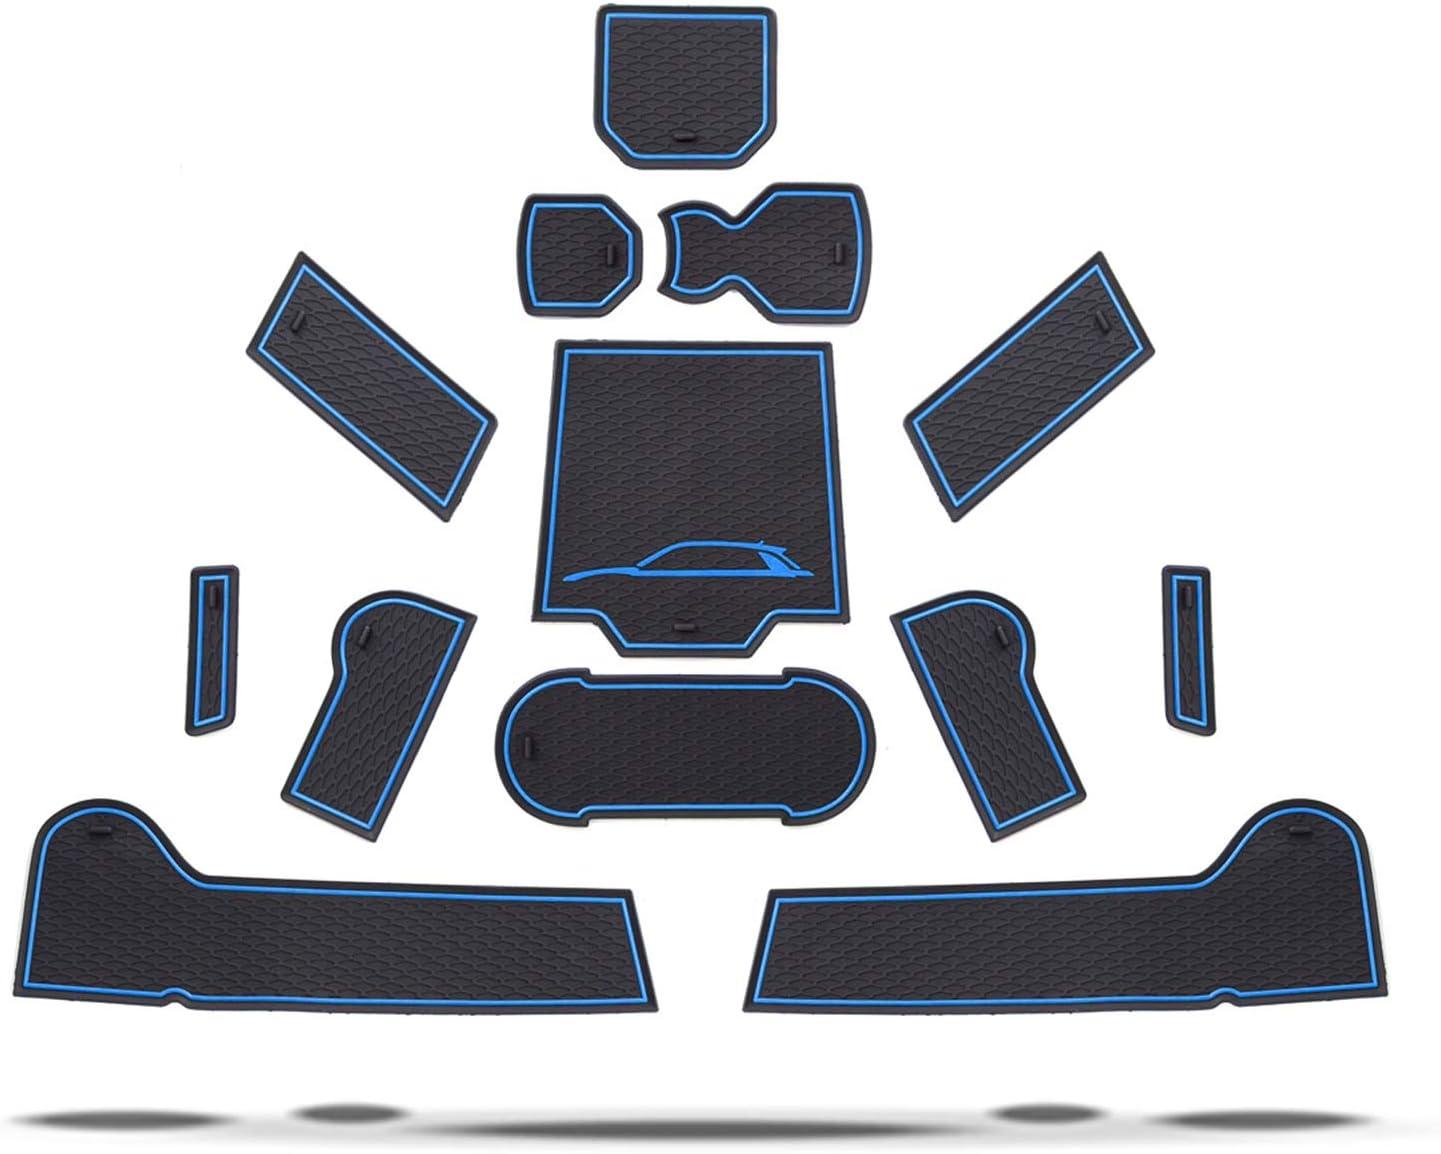 T/ür Becherhalter Slot Matten Auto Innere T/ürschlitz Arm Box Aufbewahrung Matten Pads Gummi Antirutschmatten Rot RUIYA t-ROC Antirutschmatten